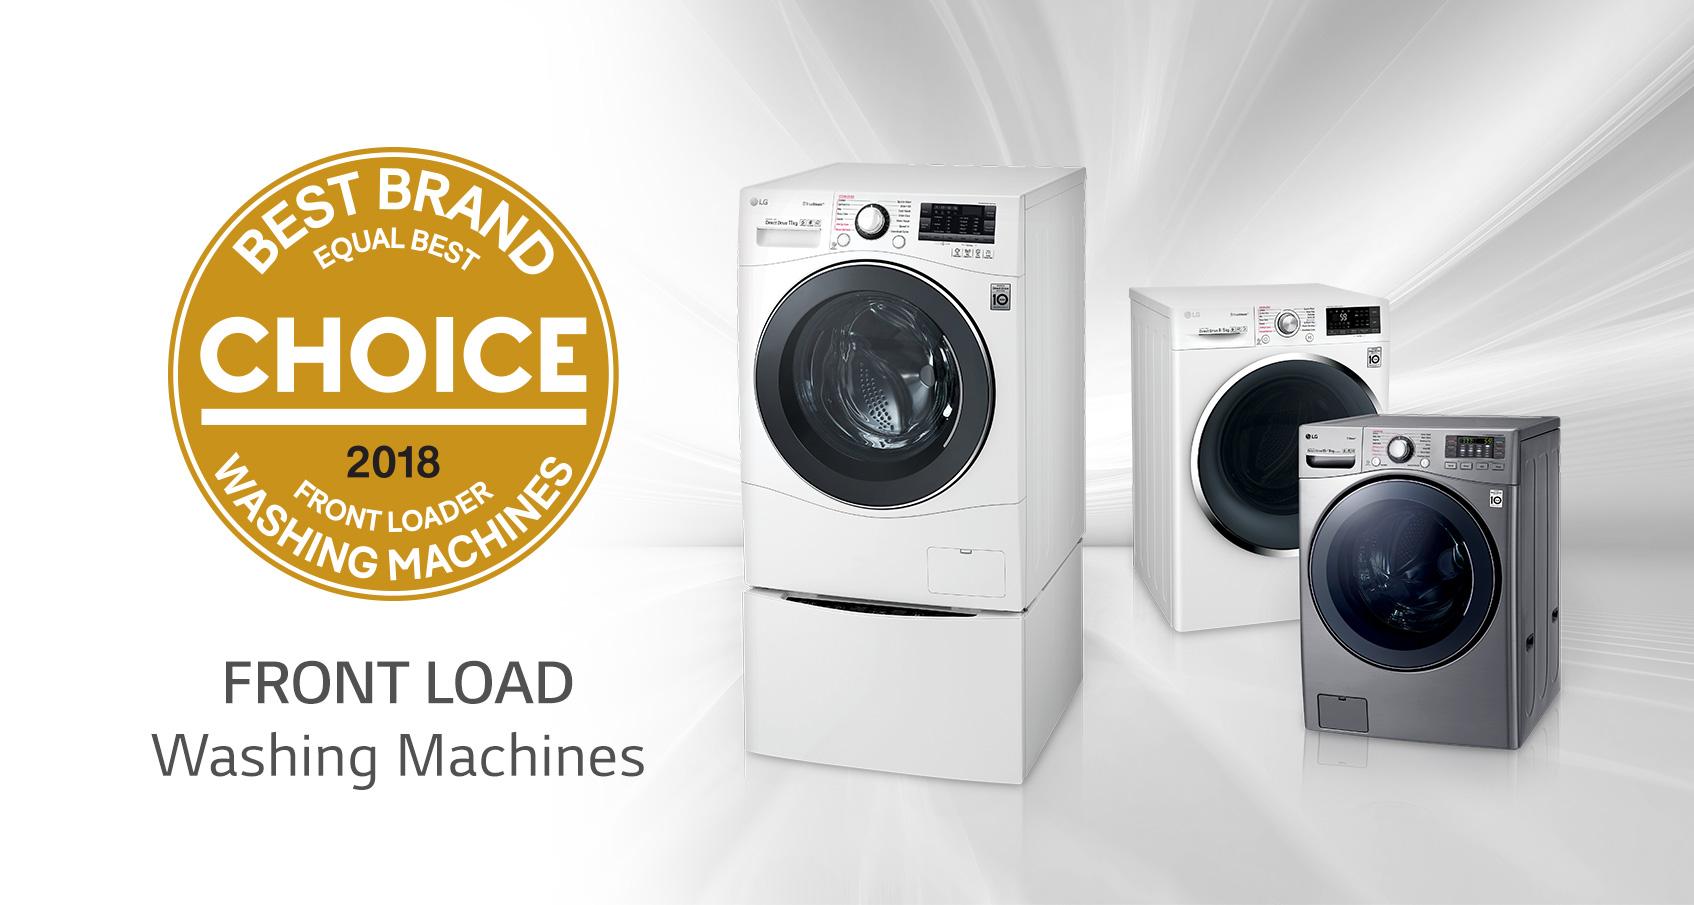 LG - LG TVs, Washing Machines, Fridges, Phones & Dryers